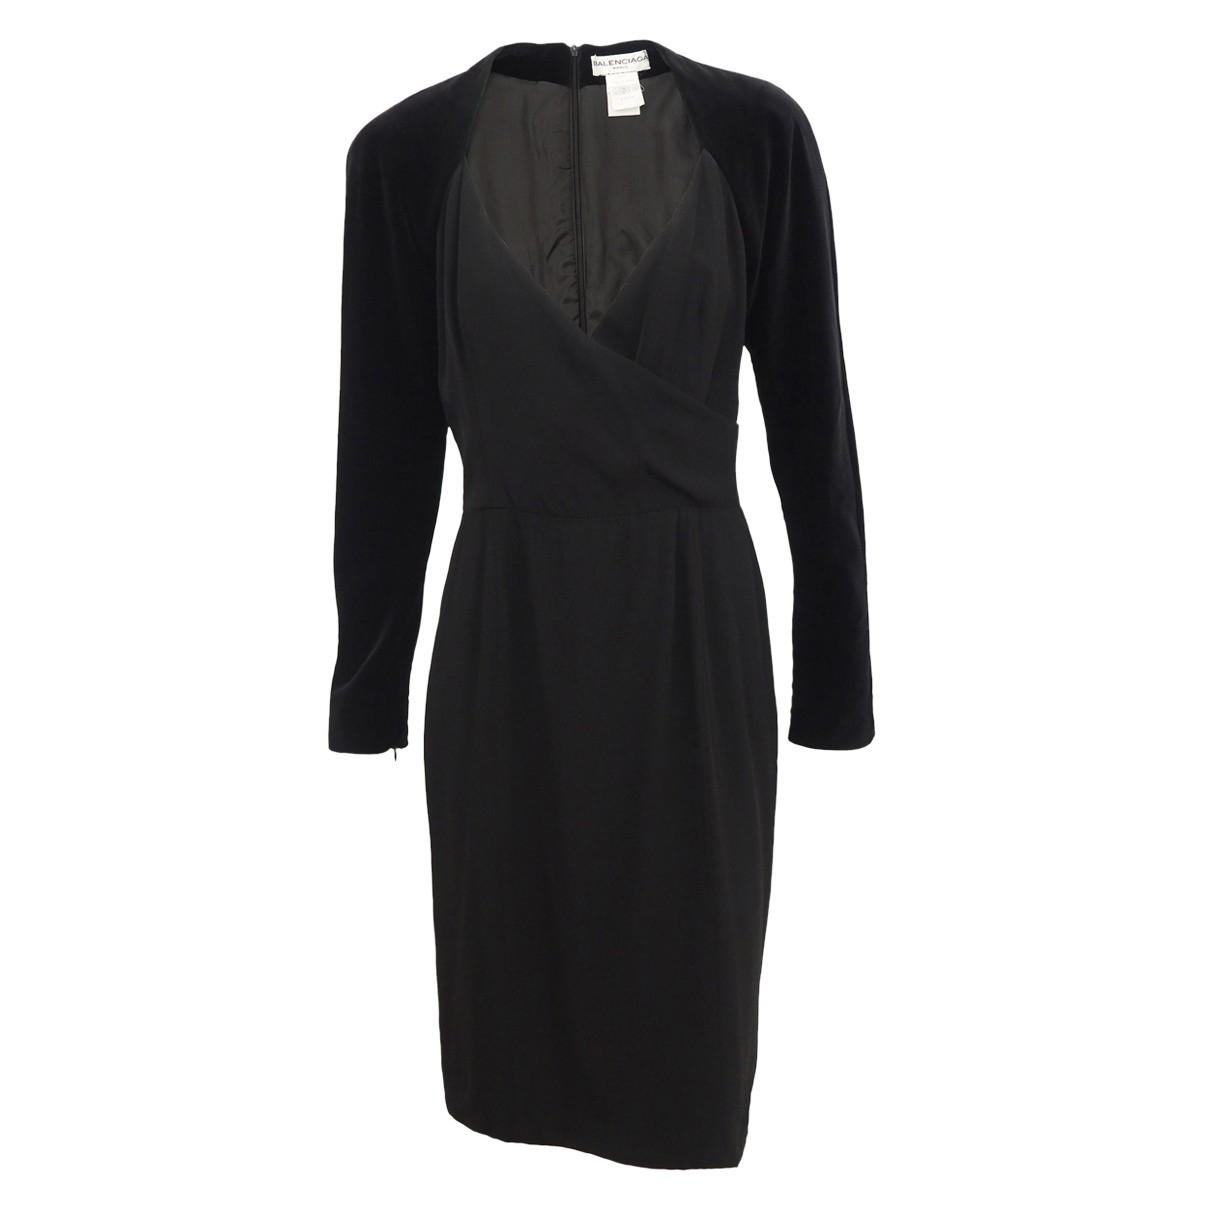 Balenciaga N Black dress for Women L International